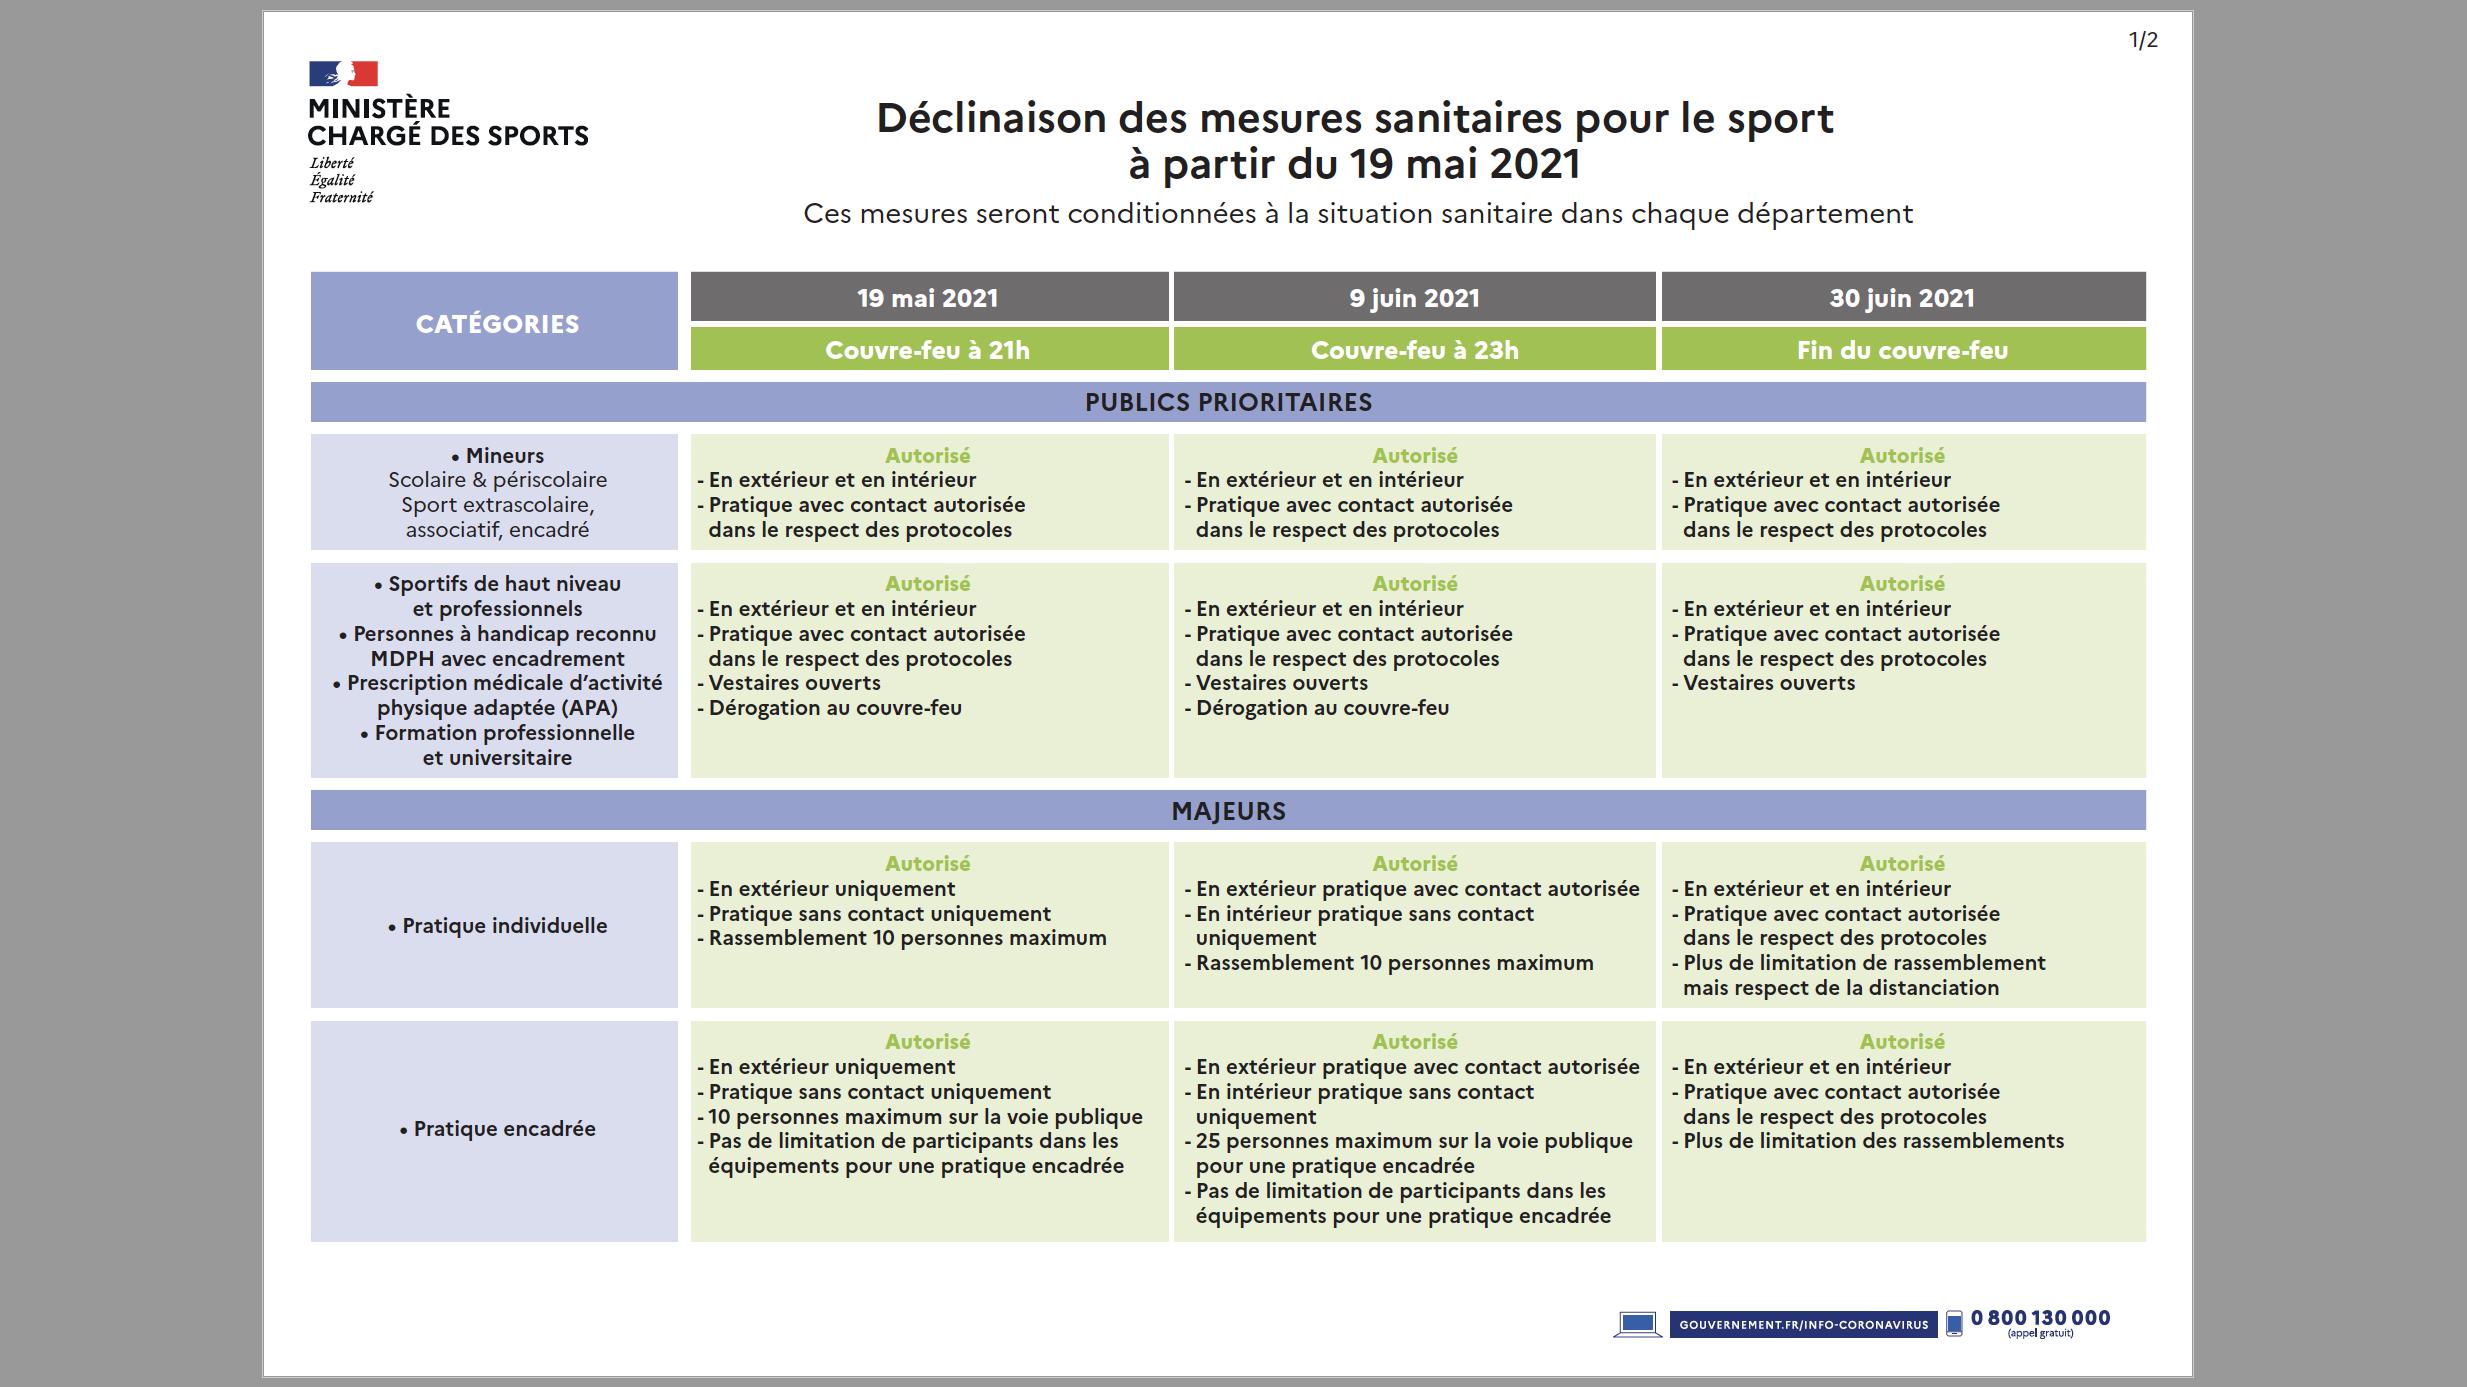 Tableau Ministère 12 mai 2021 1/2